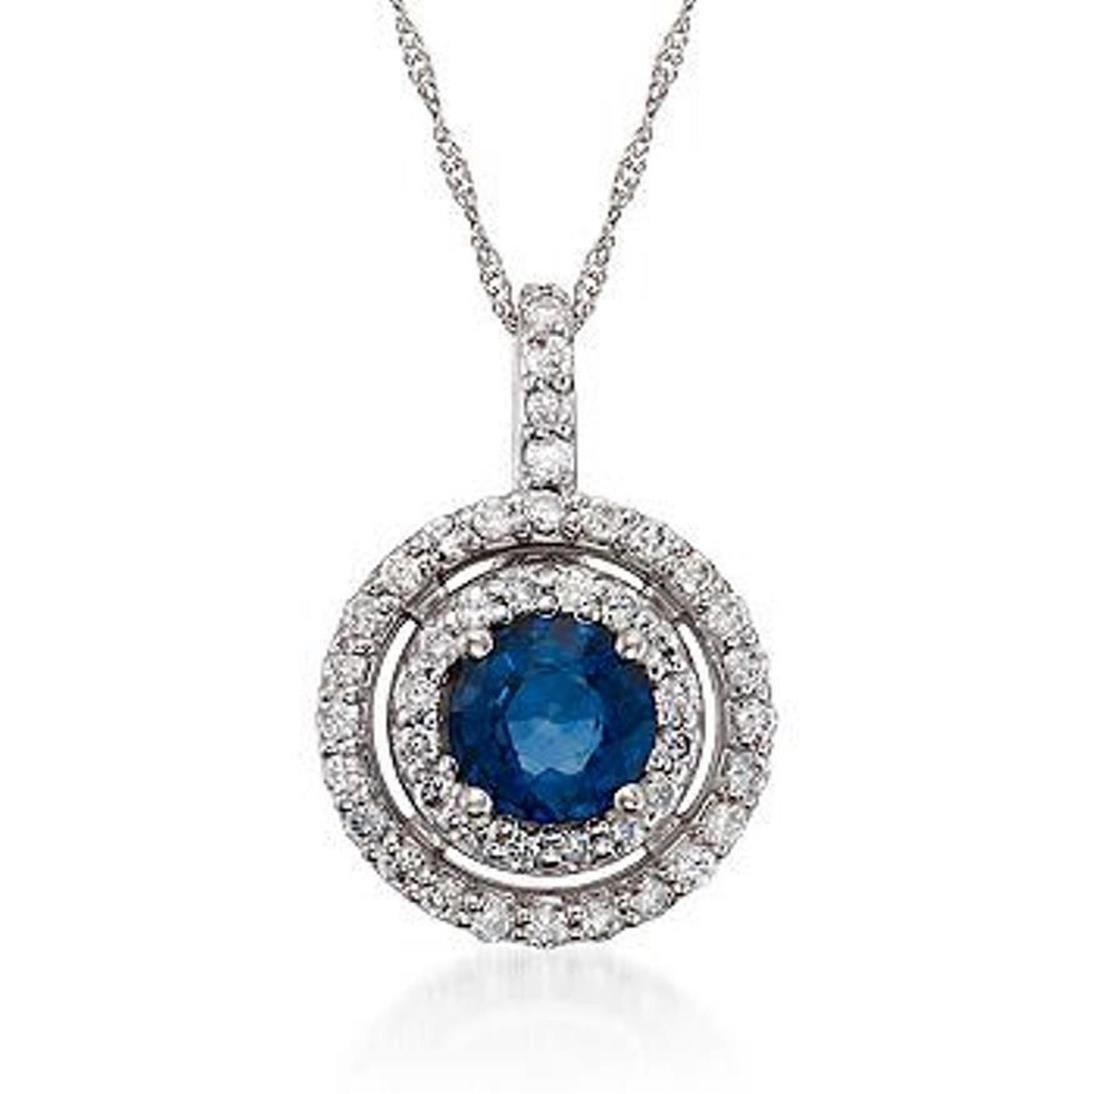 1.10 Carat Sapphire and .45 ct. t.w. Diamond Pendant